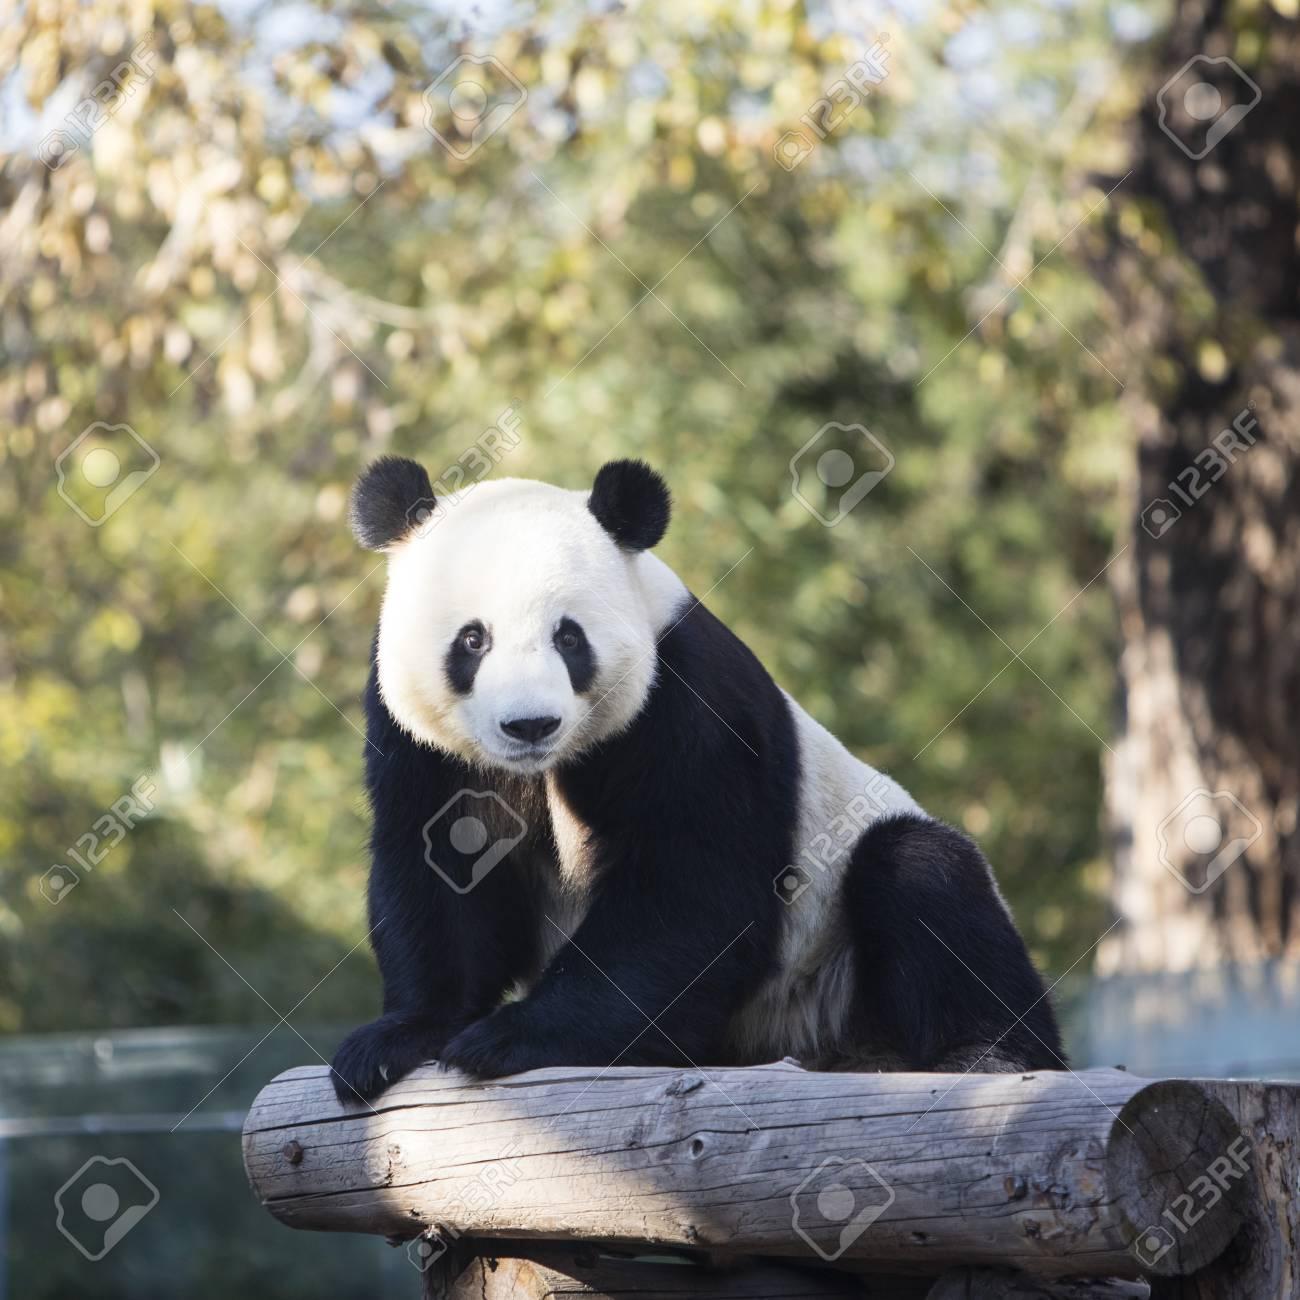 A giant panda in the zoo - 89745418